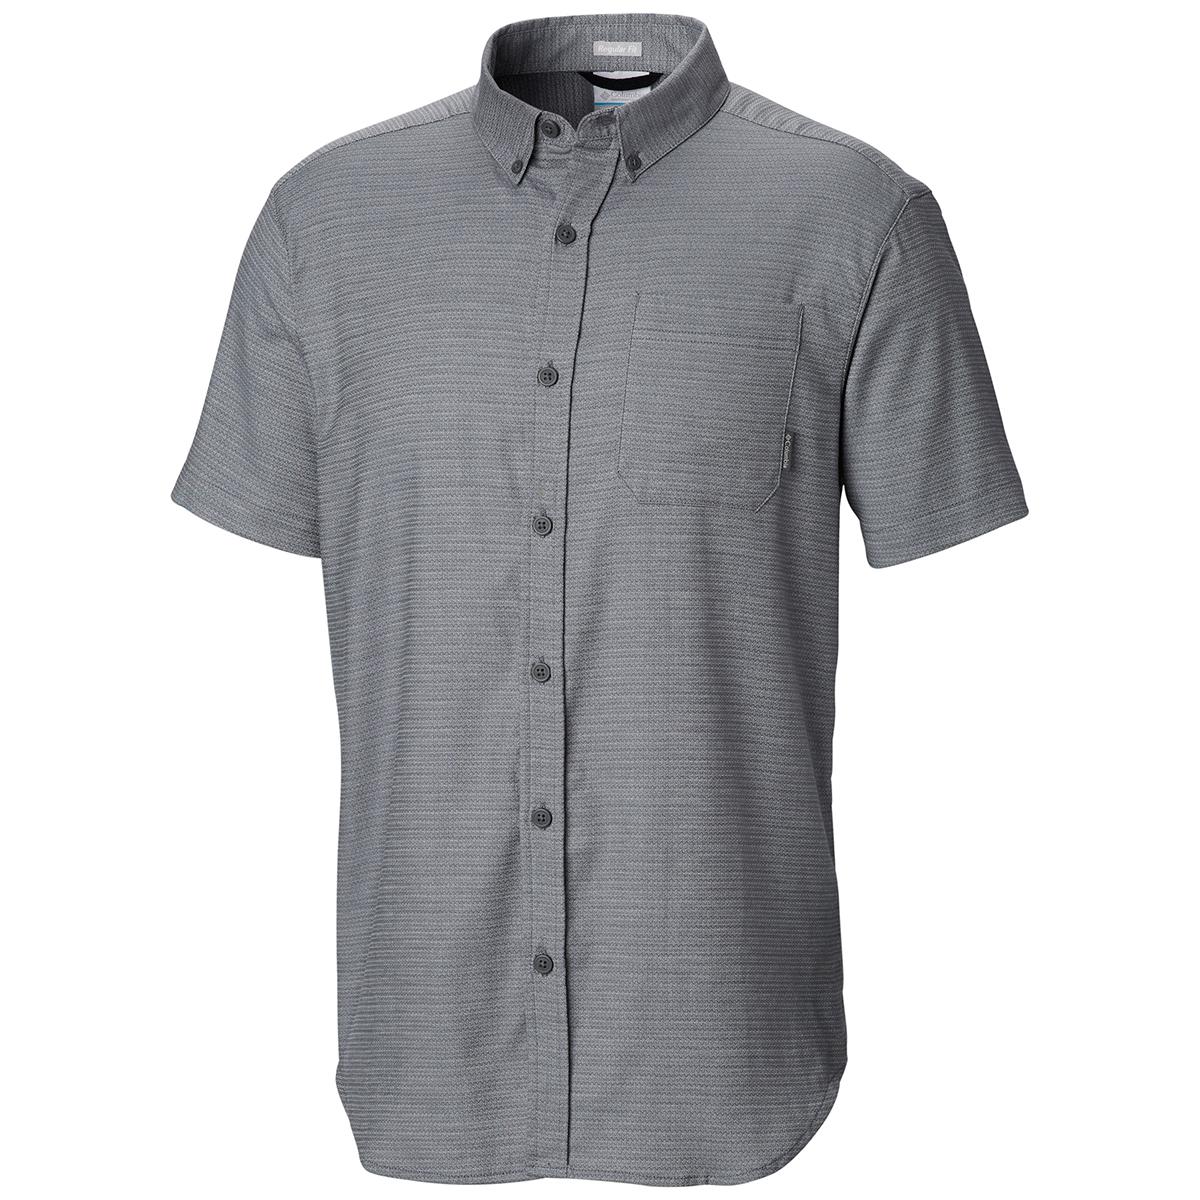 Columbia Men's Rapid Rivers Mirage Short-Sleeve Shirt - Black, S